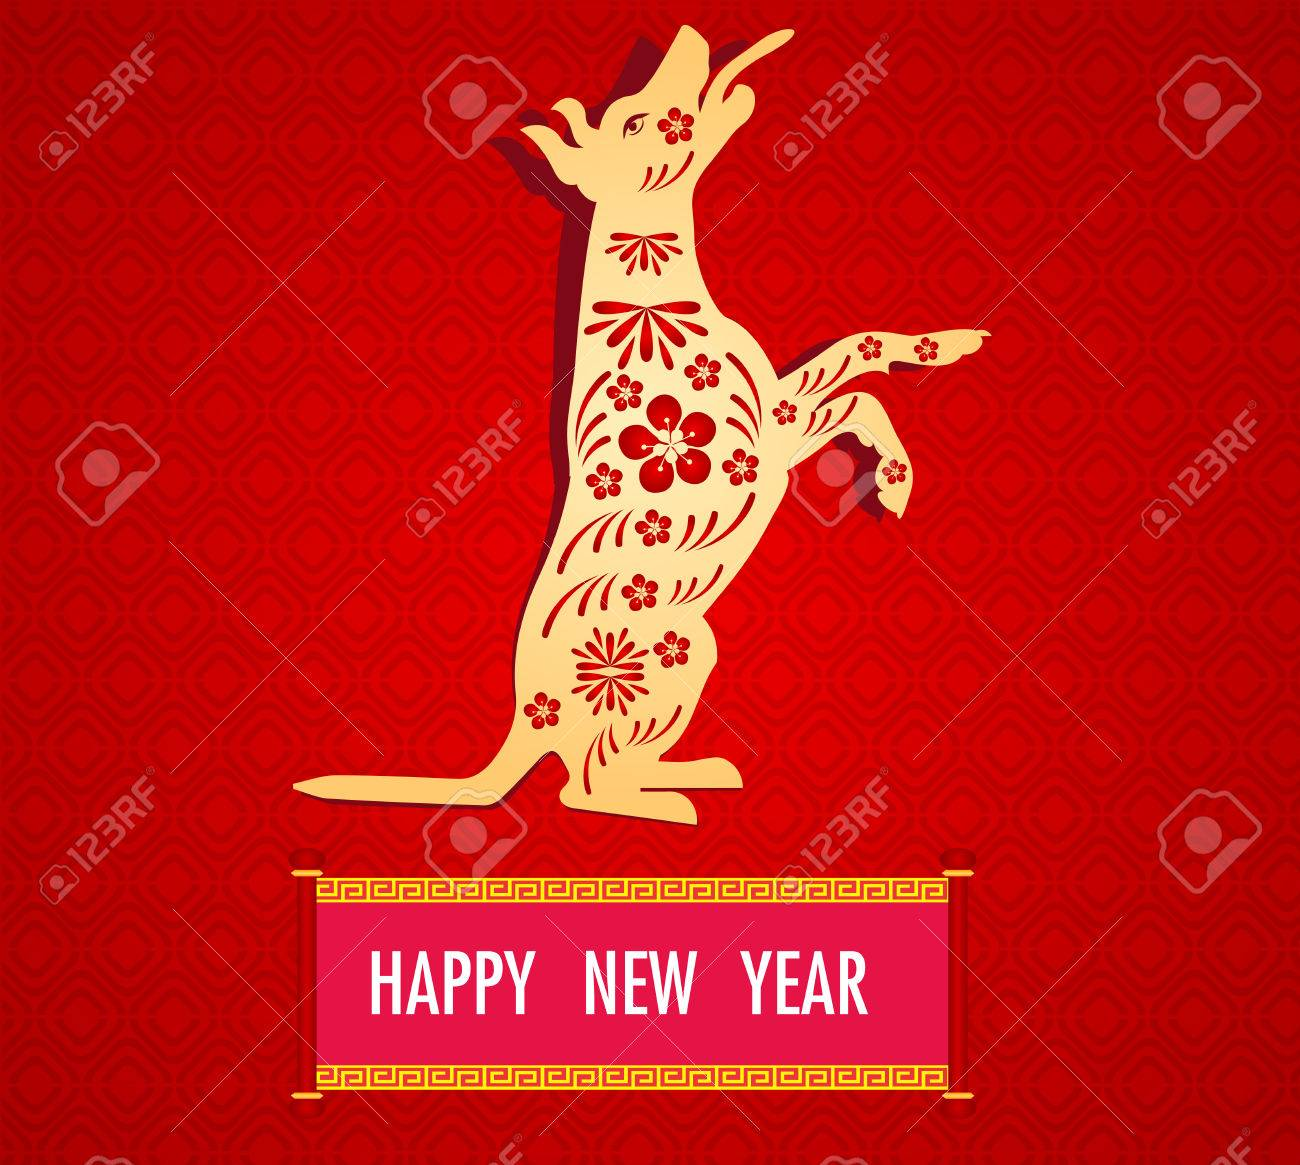 happy new year 2018 brush celebration chinese new year of the dog lunar new year - Happy Lunar New Year In Chinese